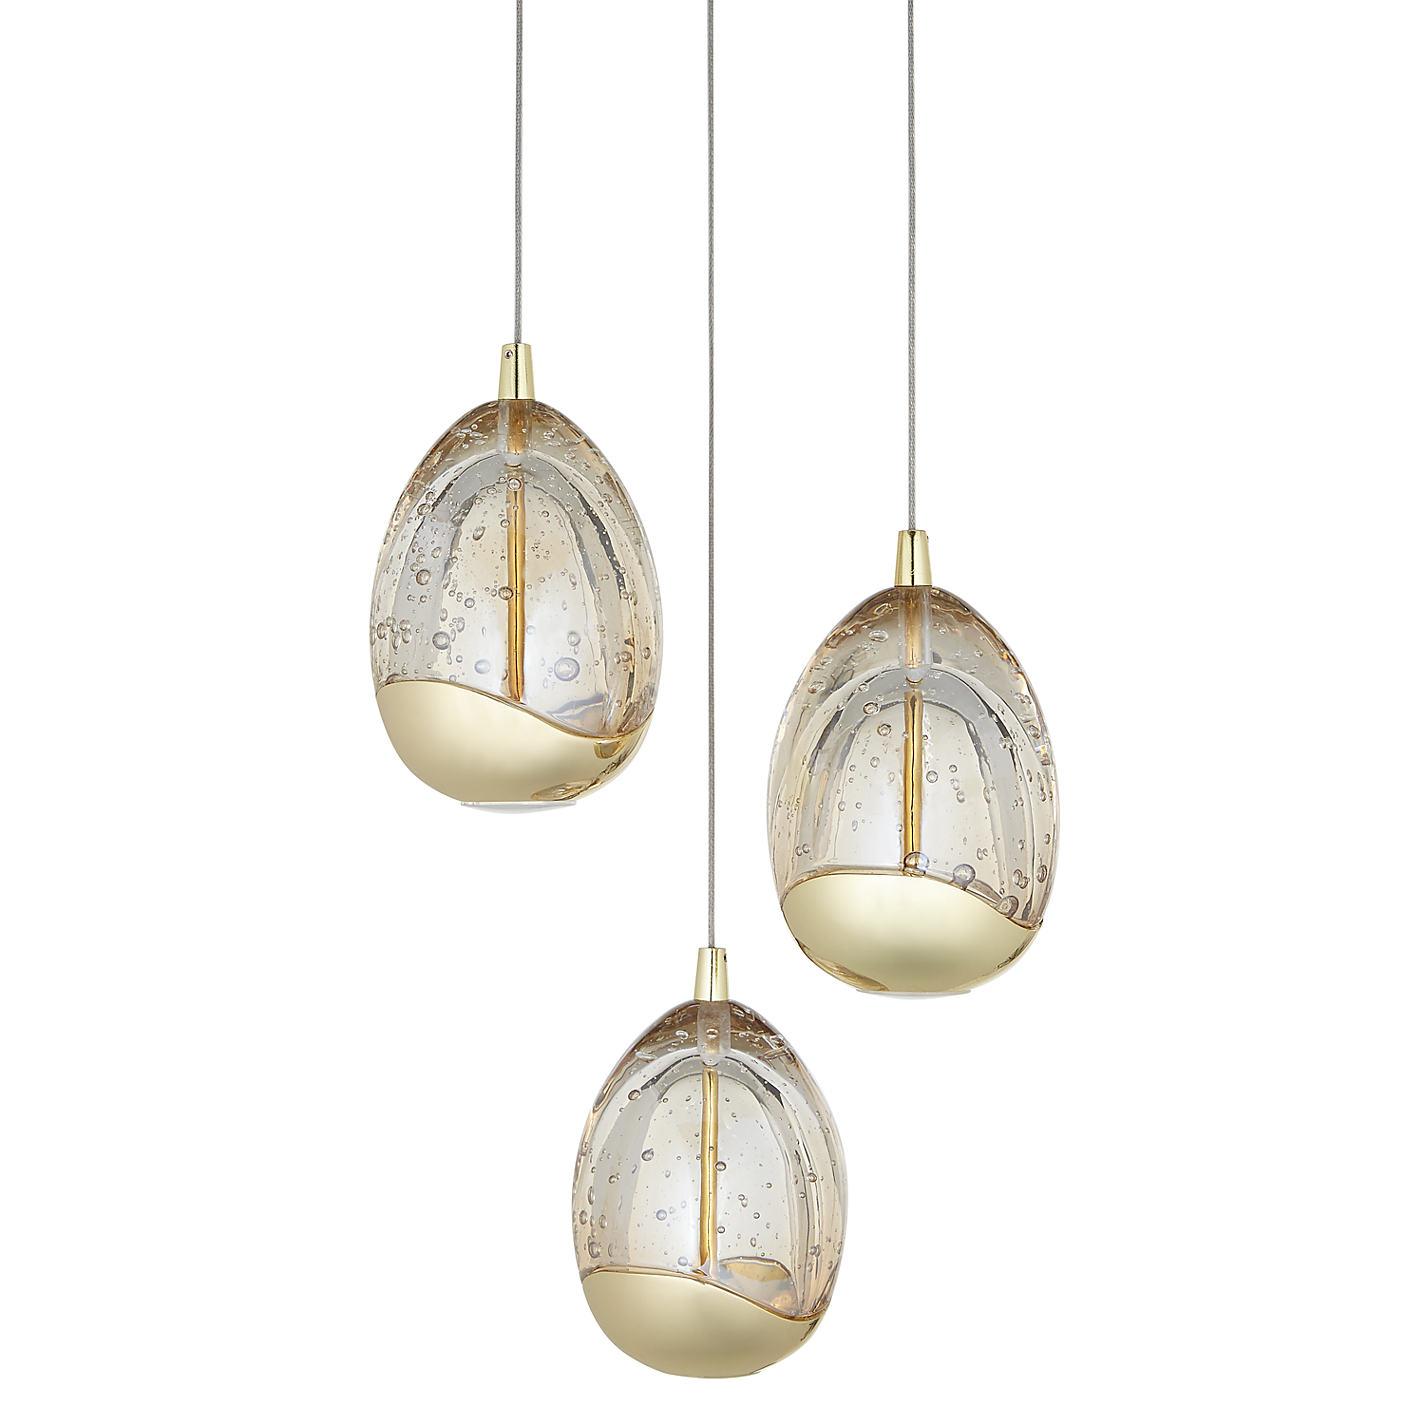 ... Buy John Lewis Droplet LED 3 Pendant Ceiling Light Online at johnlewis.com ...  sc 1 st  John Lewis & Buy John Lewis Droplet LED 3 Pendant Ceiling Light | John Lewis azcodes.com